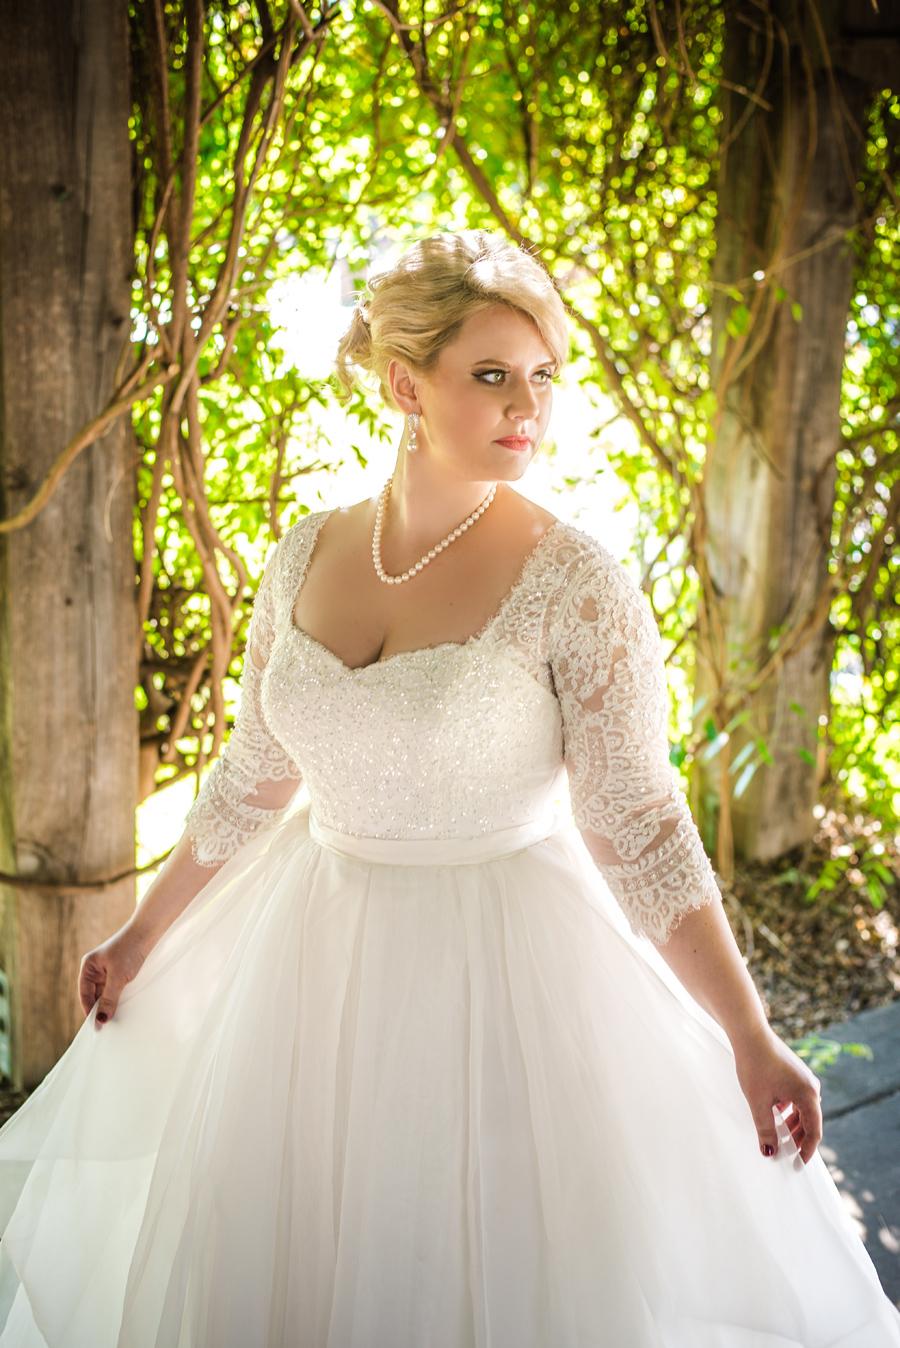 Wedding Dress Shops In Arkansas 51 Trend Such a sweet wedding